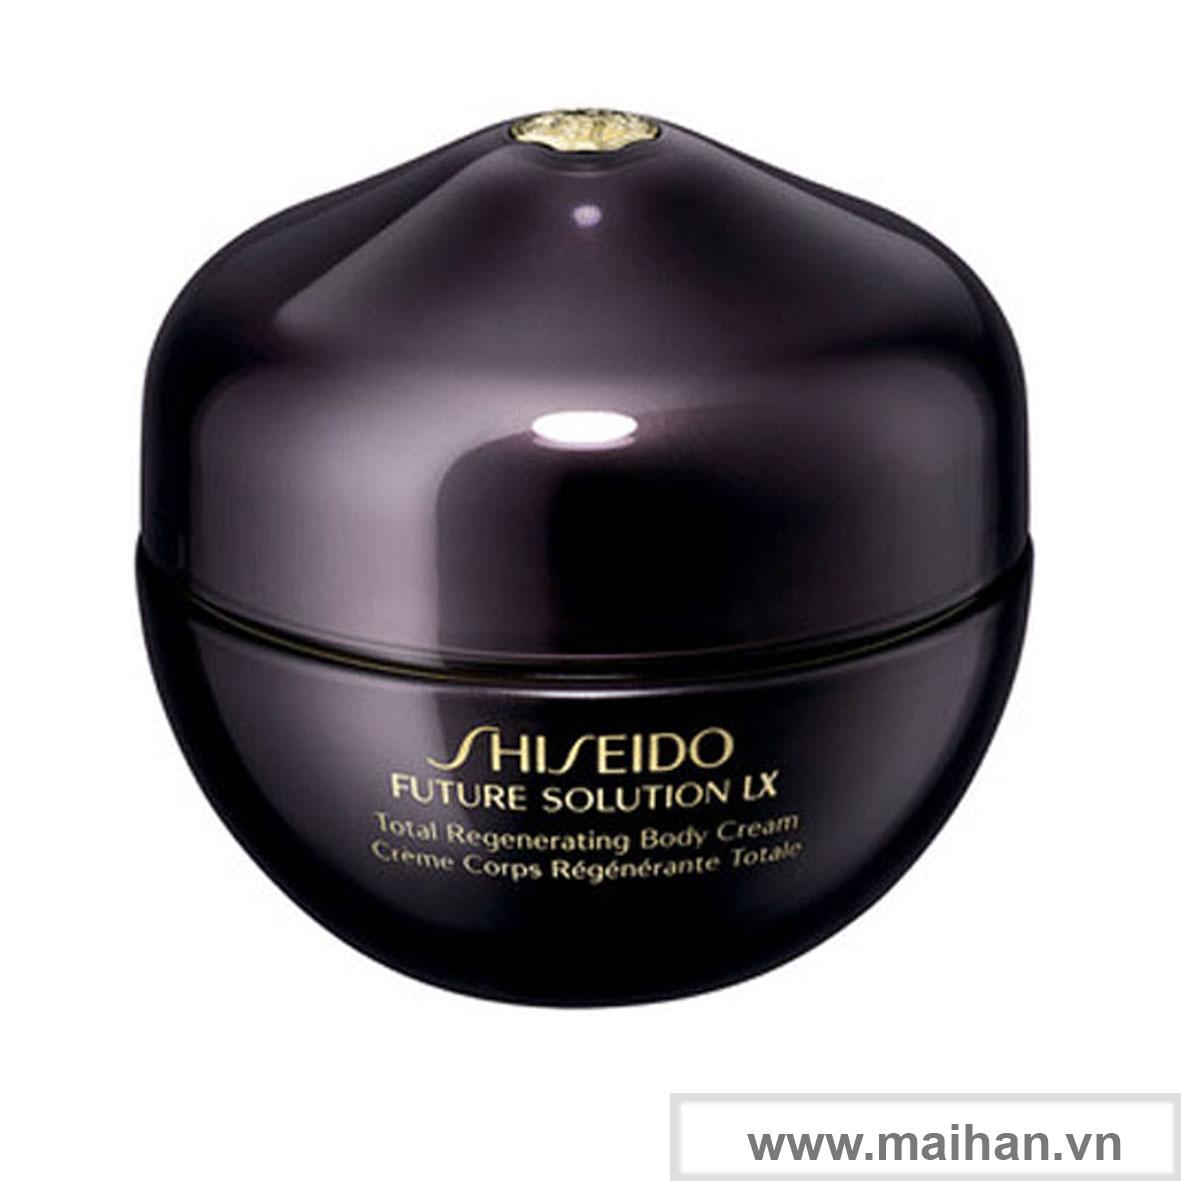 Kem dưỡng thể Shiseido Total Regenerating Body Cream